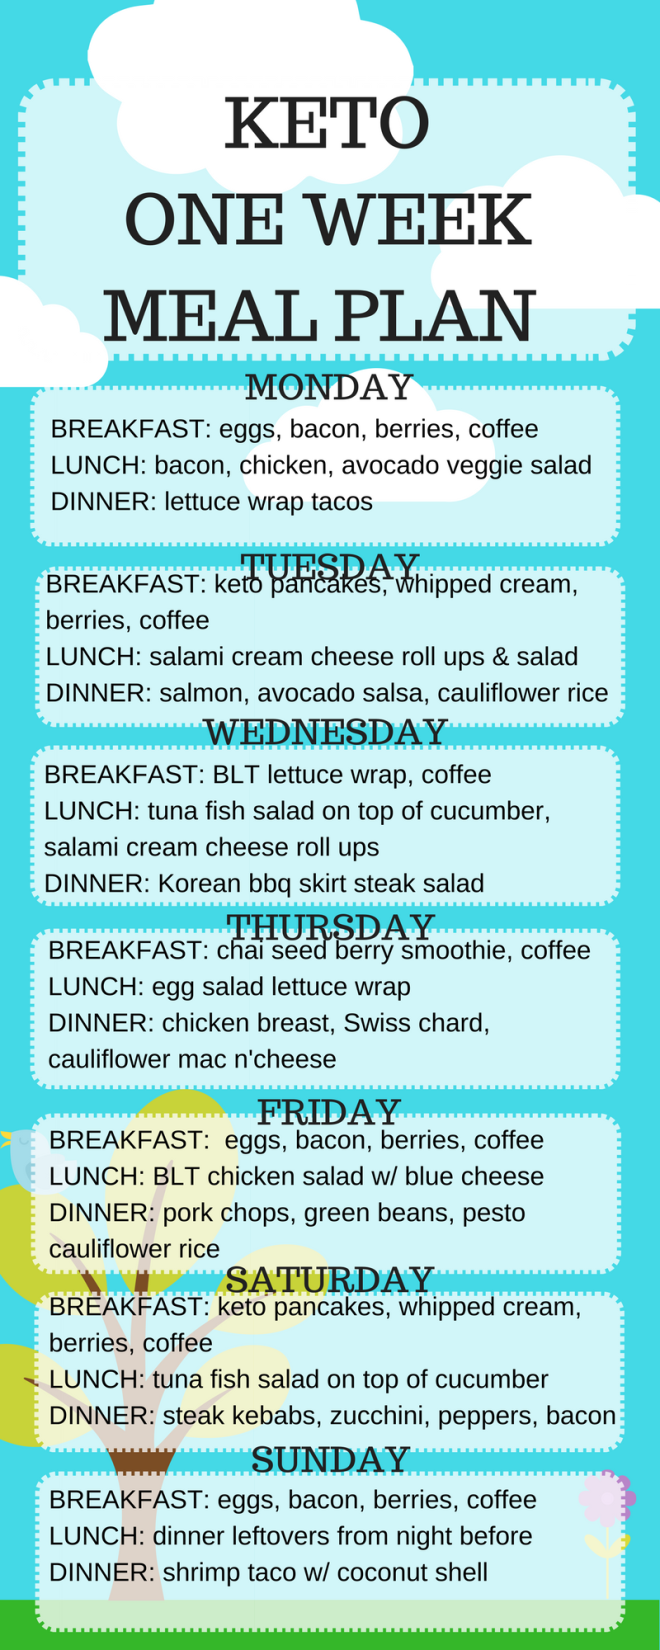 Keto One Week Meal Plan Seasonal Solutions No Carb